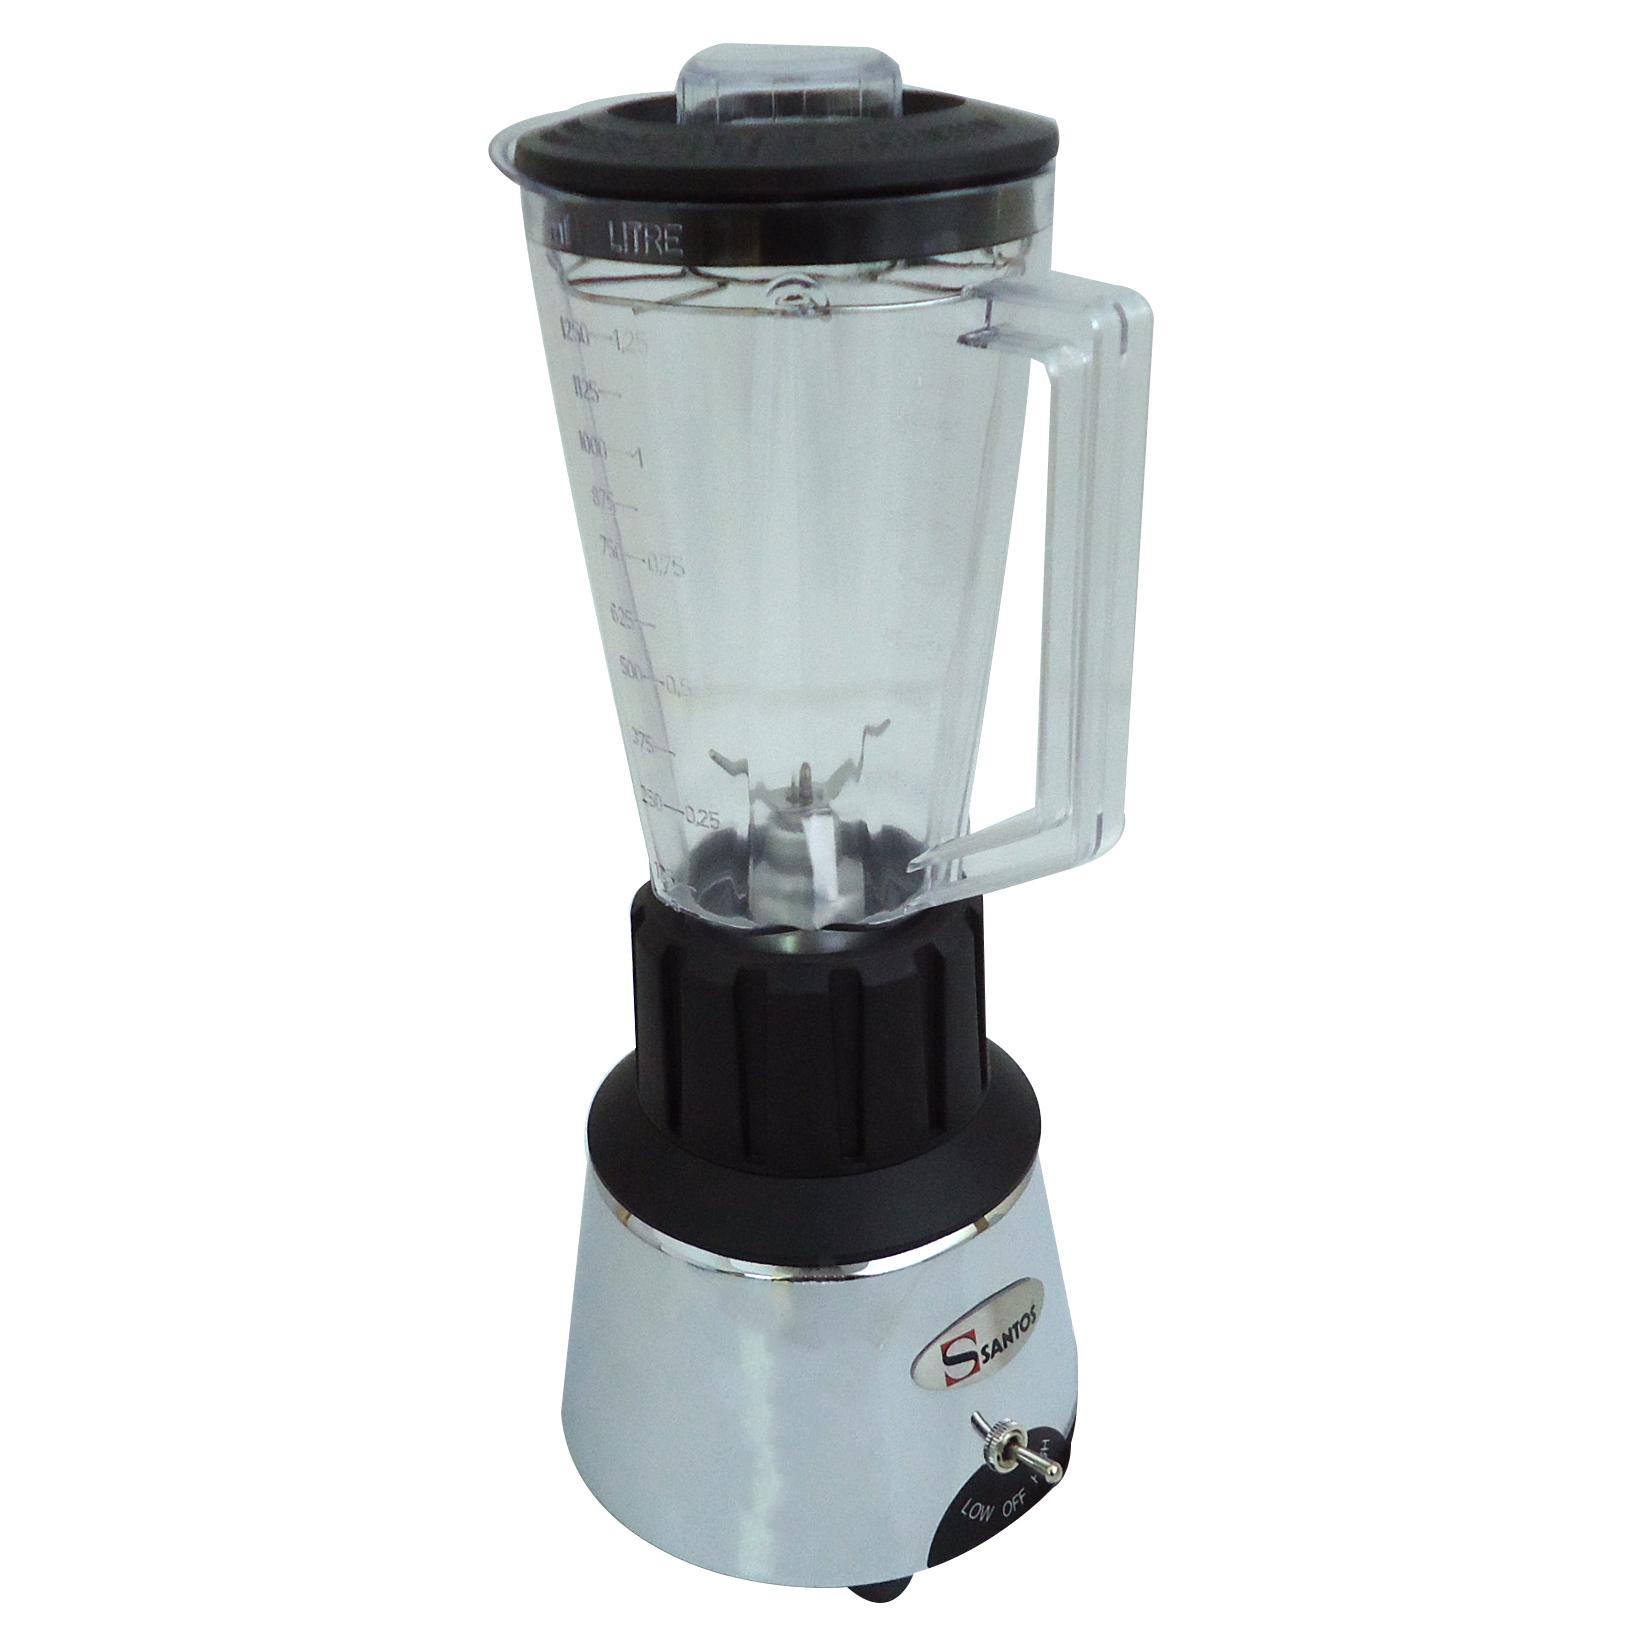 Santos No33C Μπλέντερ Χρώμιο Με Polycarbonate Κανάτα 1,25Lit - Ισχύς: 600Watt (Γ προσφορές   επαγγελματικός εξοπλισμός  επαγγελματικός εξοπλισμός   μηχανές καφέ